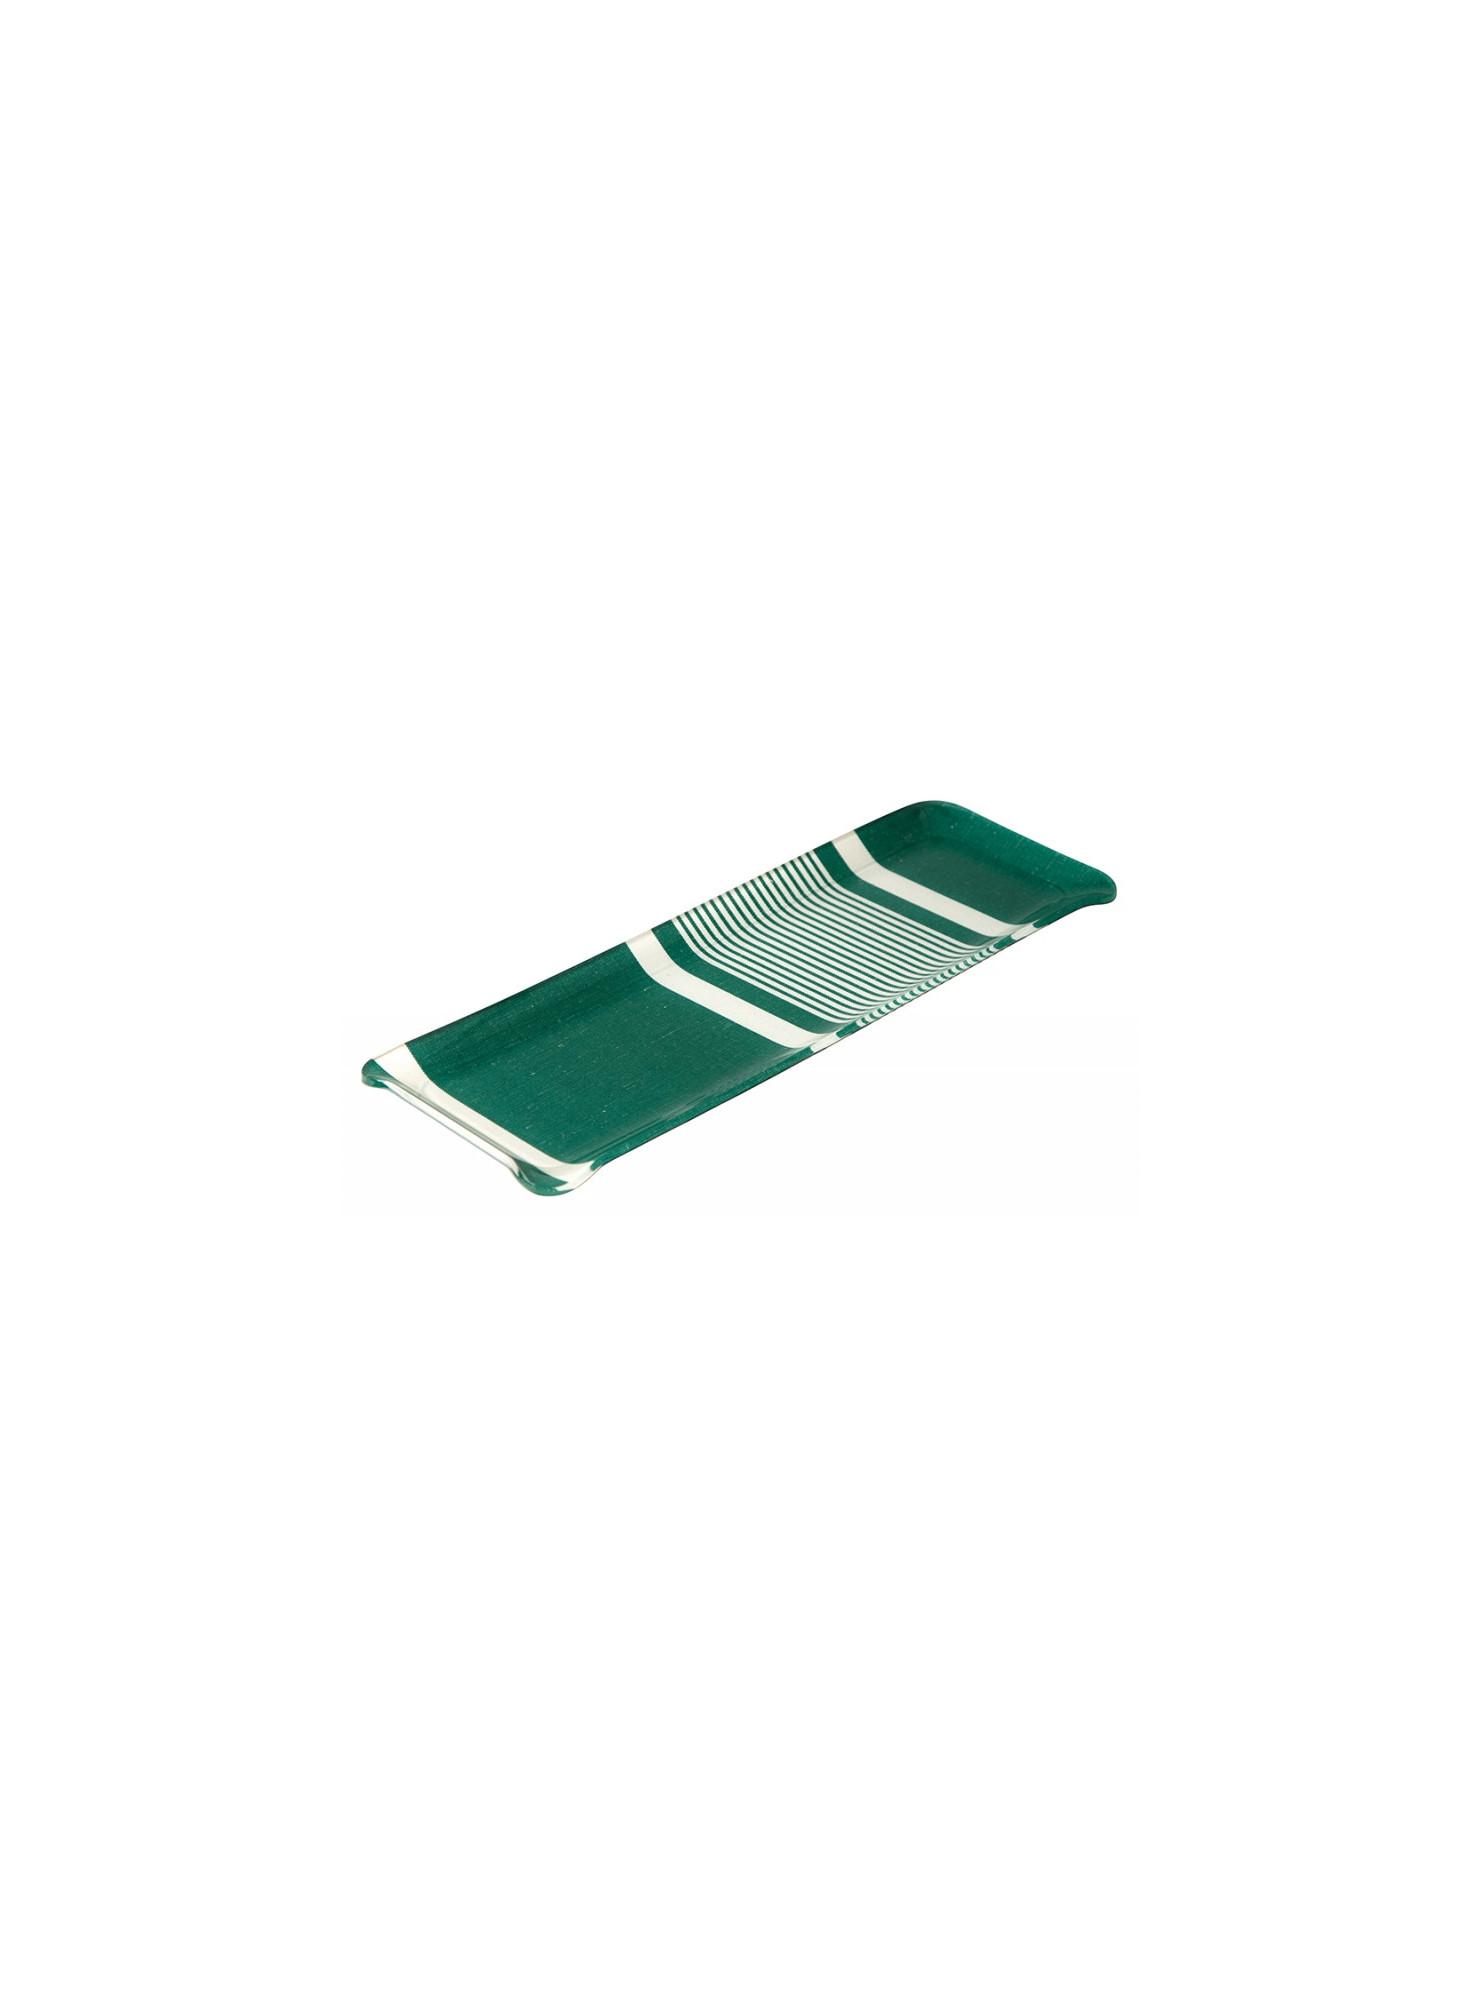 Acrylic tray Yvonne Vert tableware basque linen